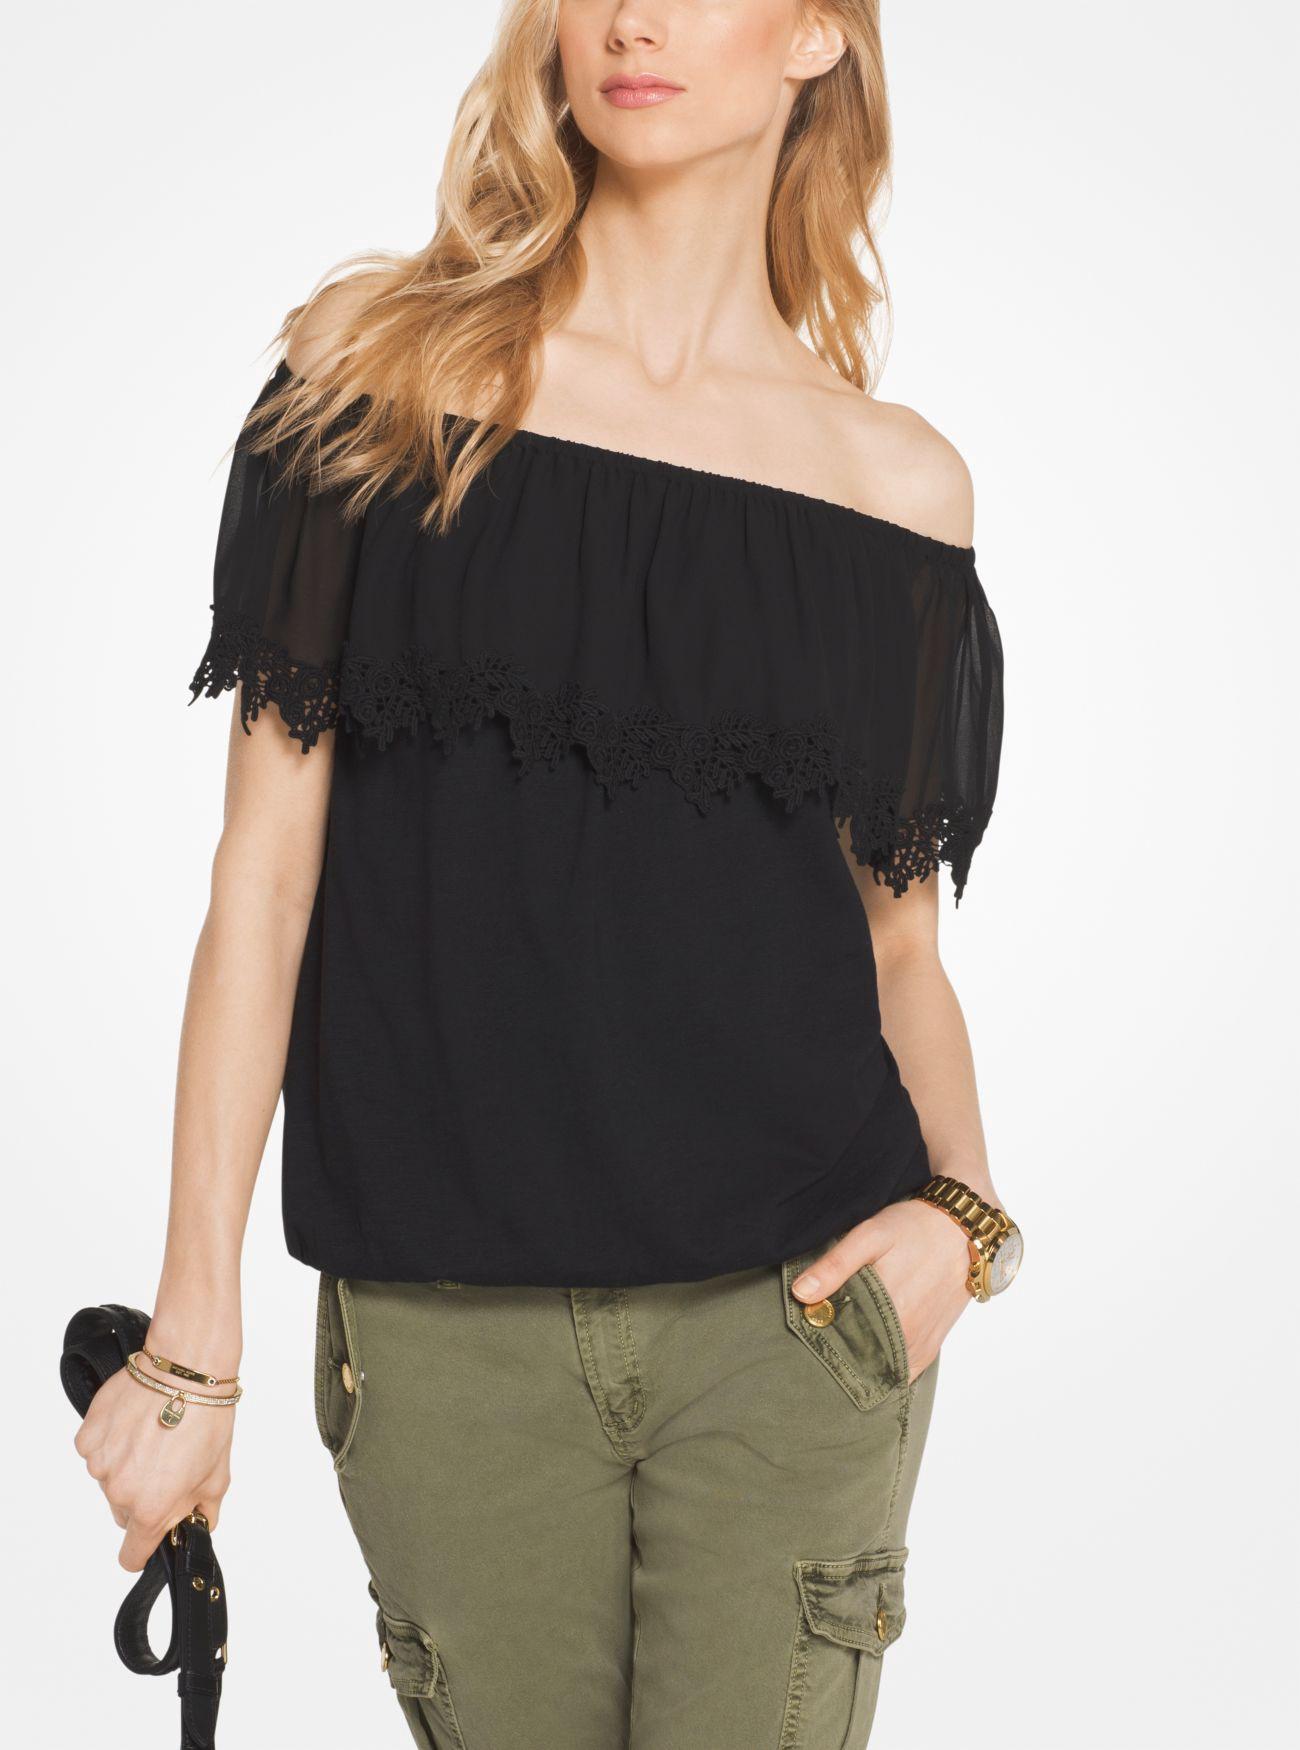 MICHAEL KORS Cotton Off-The-Shoulder Top in Black